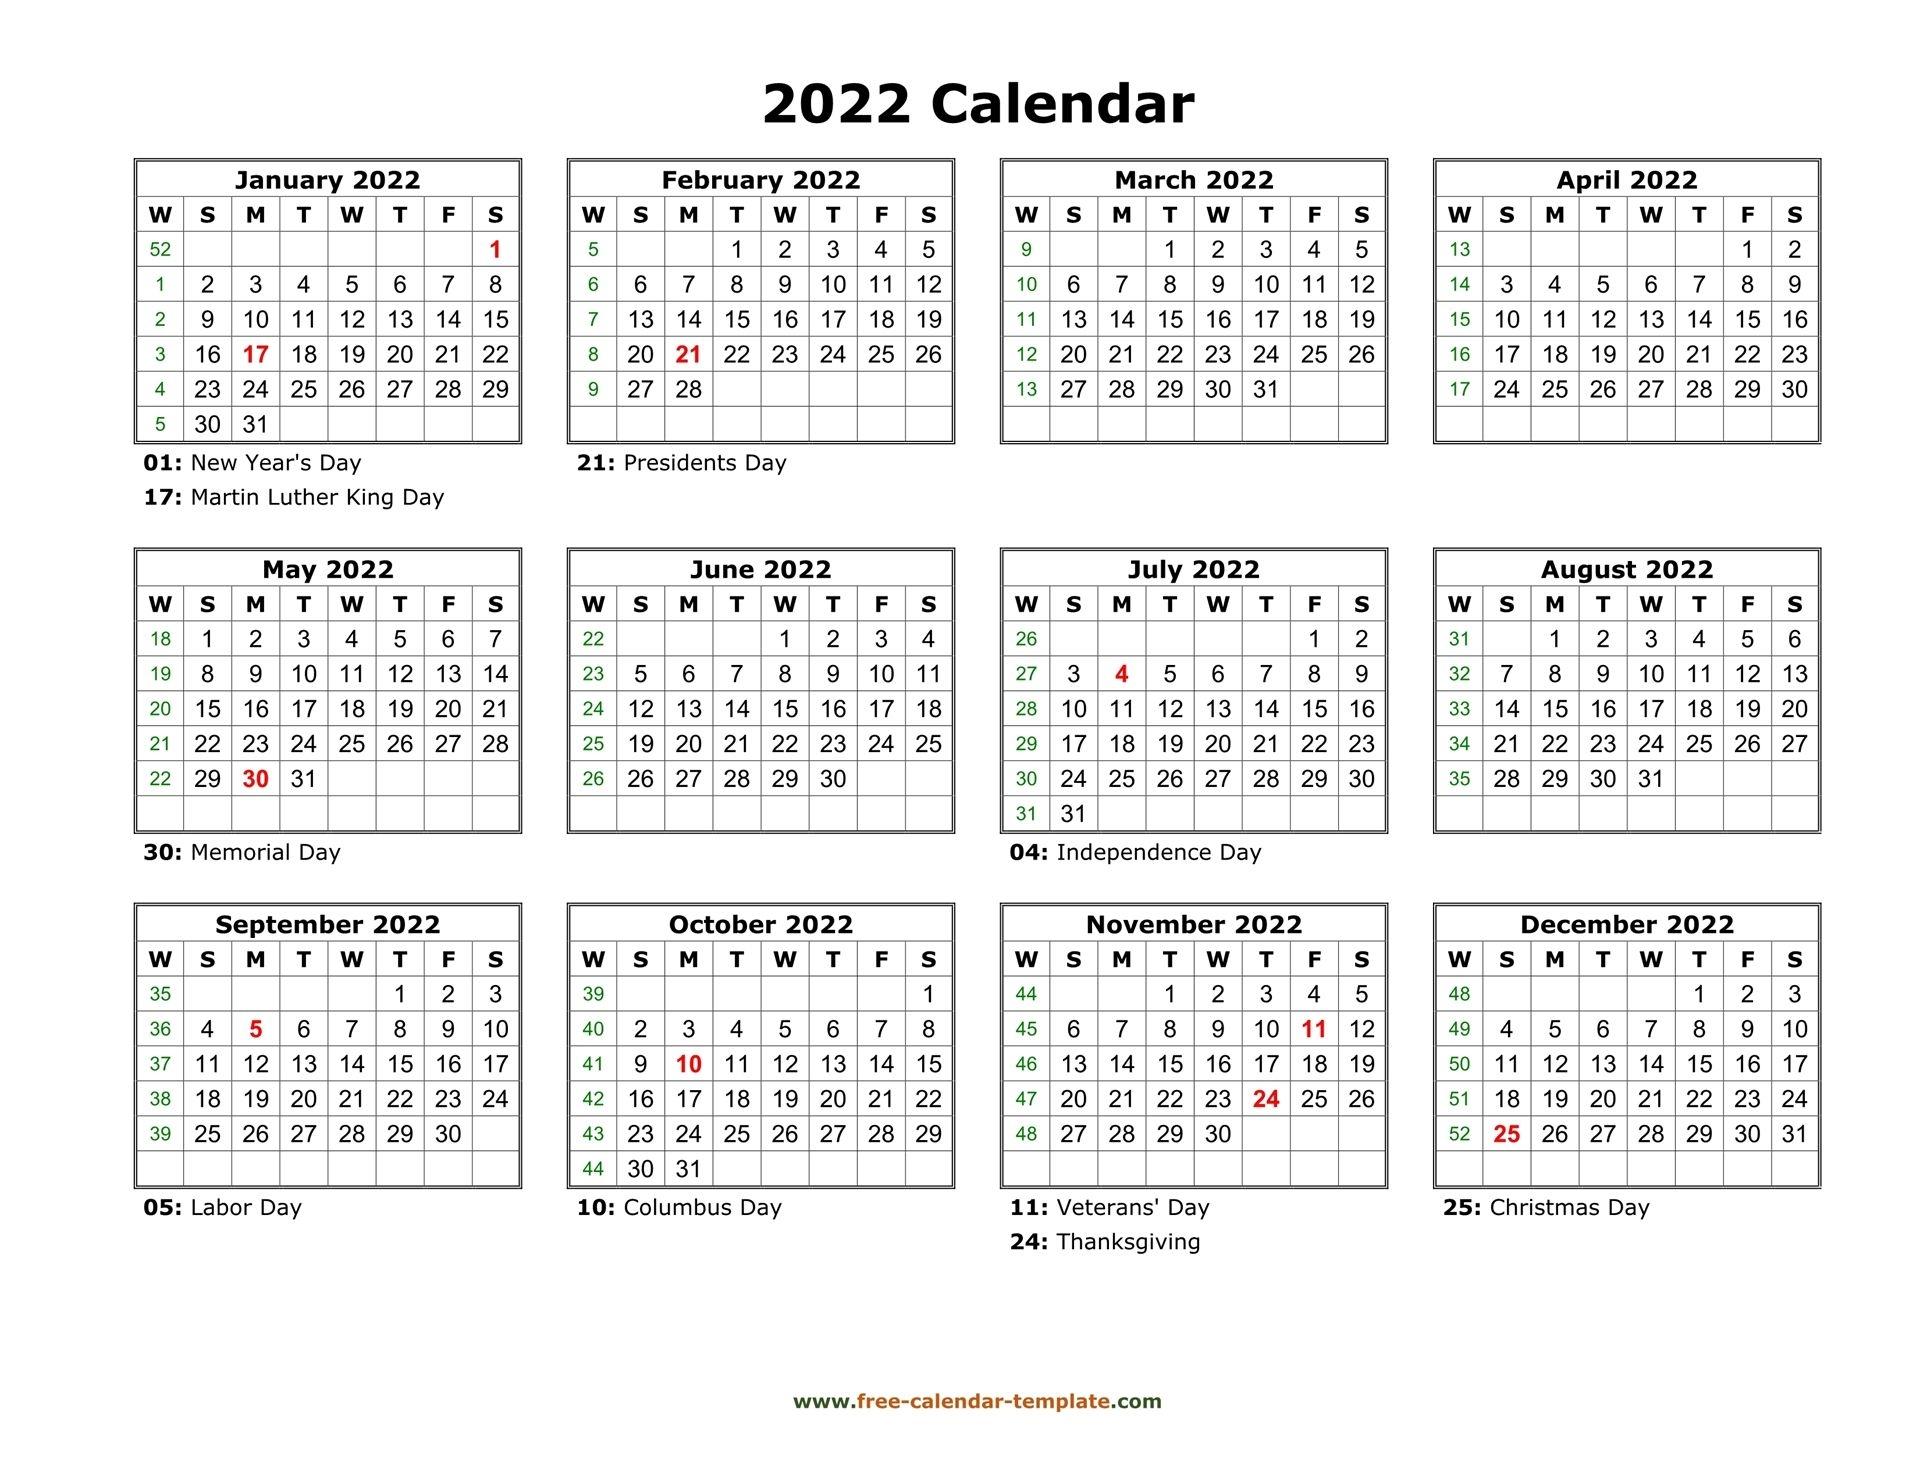 Printable Yearly Calendar 2022 | Free-Calendar-Template